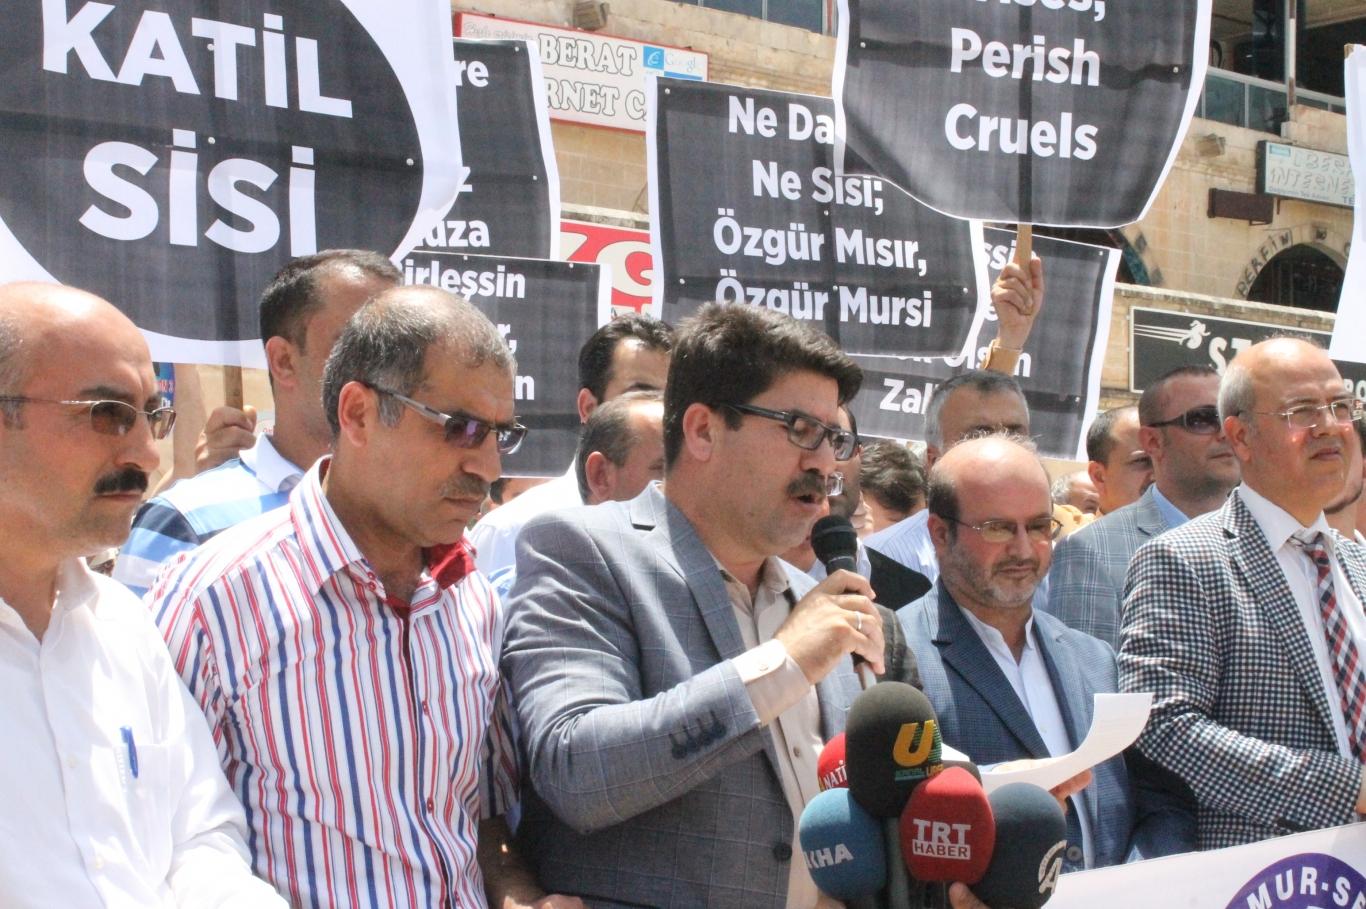 Urfalı STK'lar idam kararına tepki gösterdi